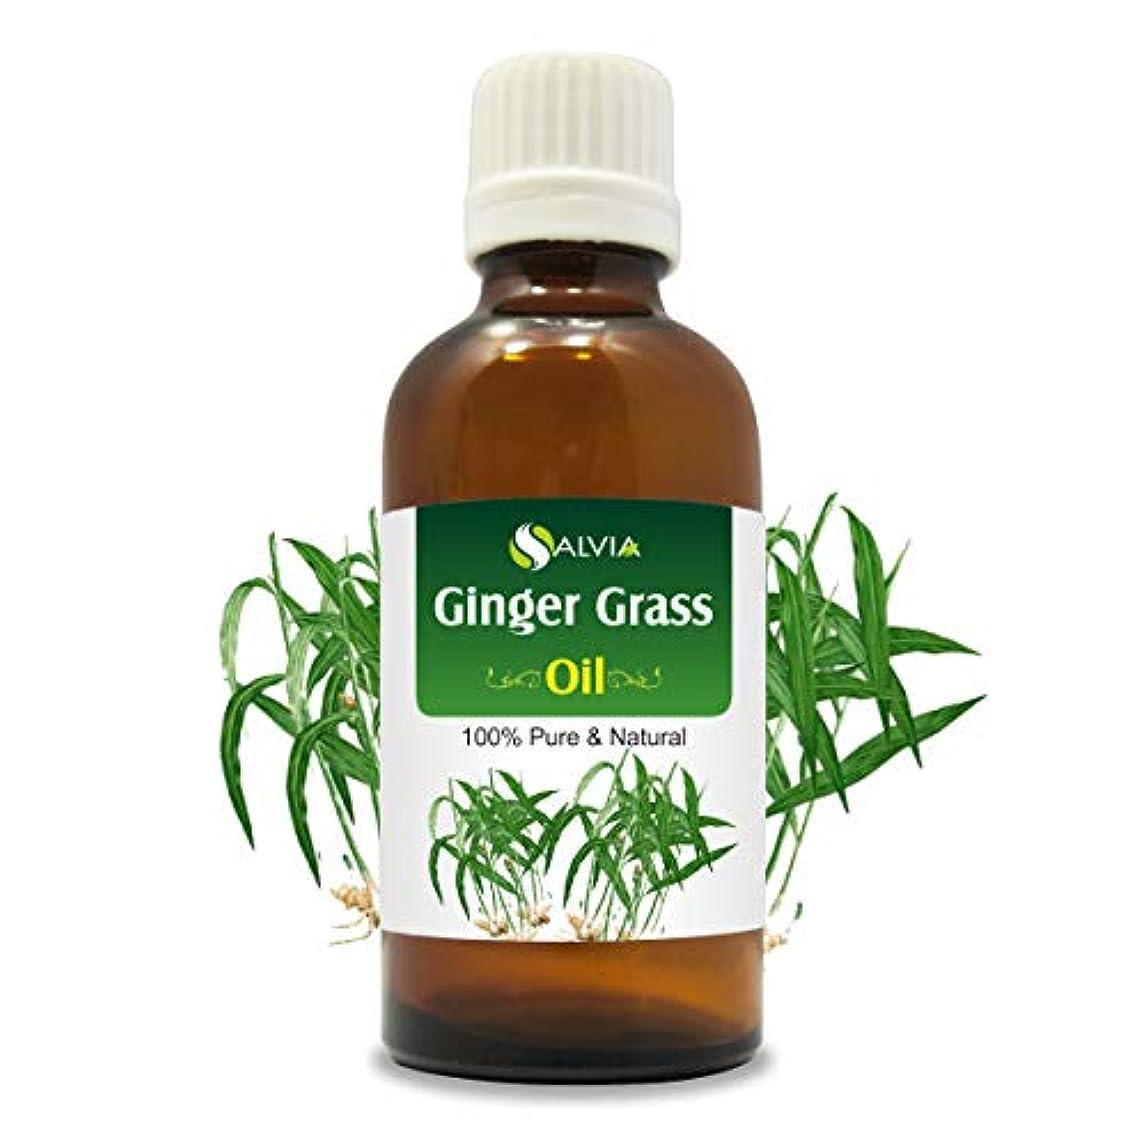 飼料忌避剤疾患Gingergrass Oil (Cymbopogon martini) var sofia 100% Natural Pure Undiluted Uncut Essential Oil 15ml